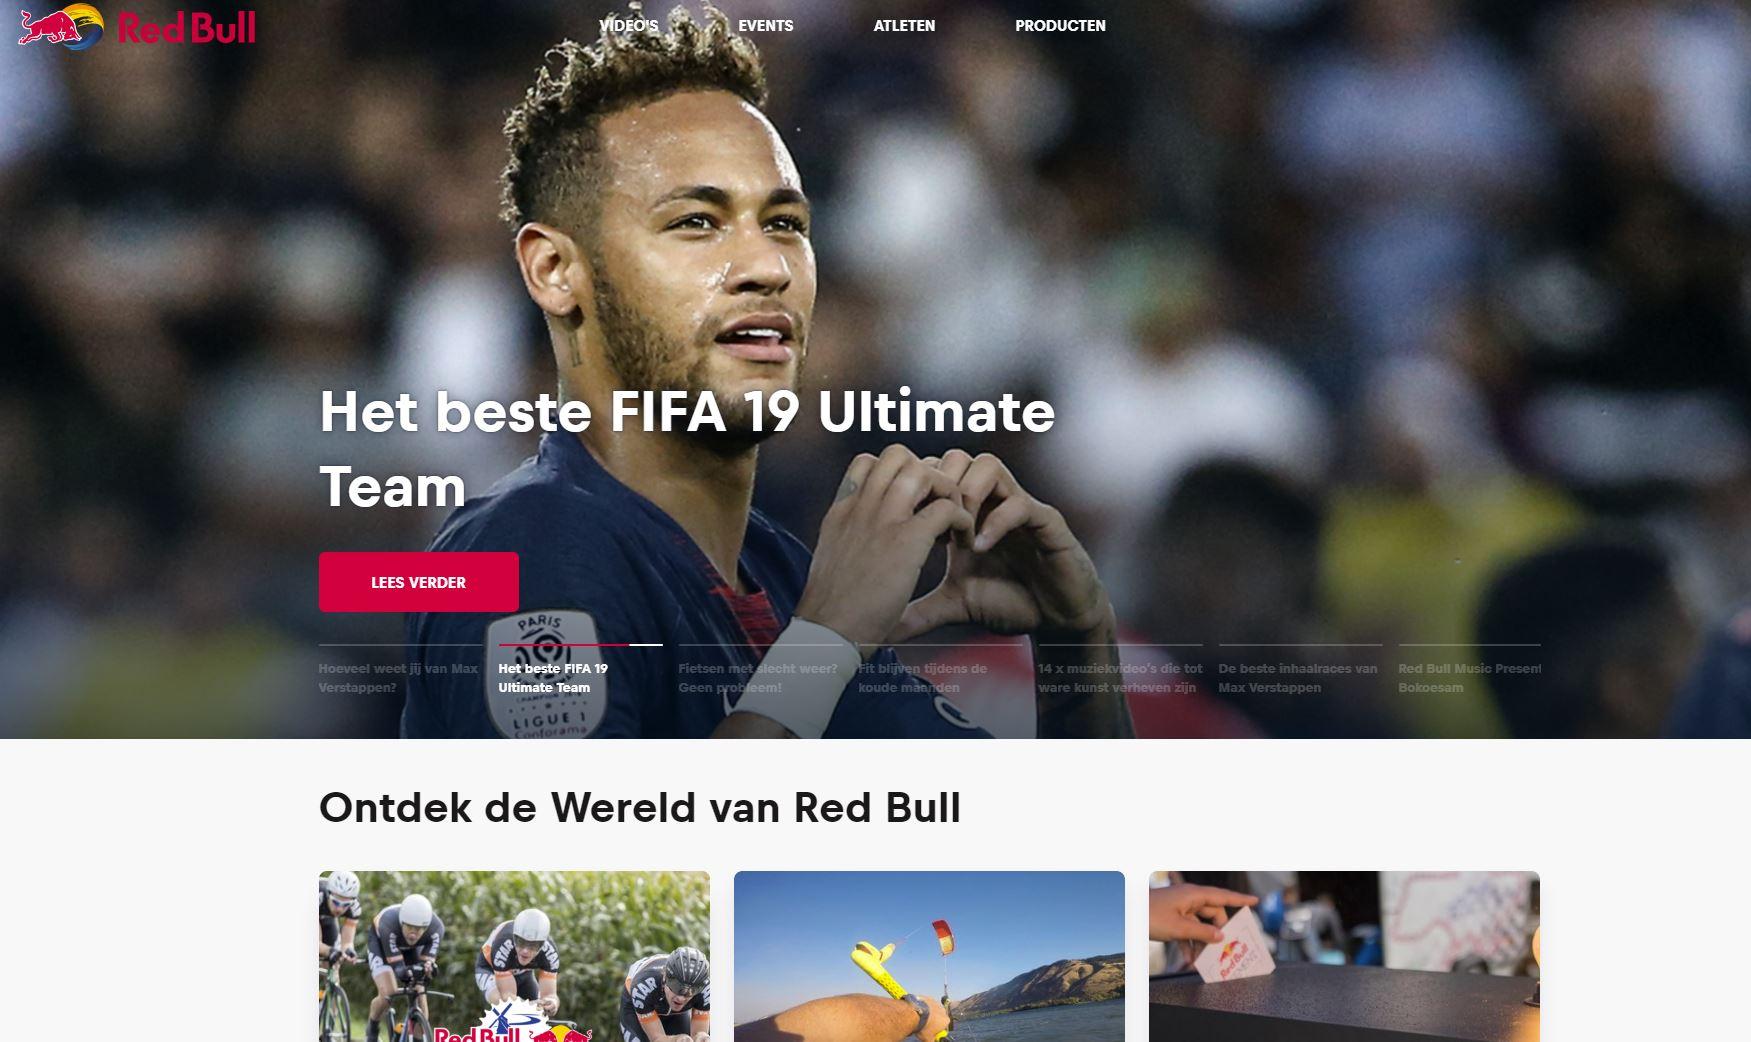 Website Redbull